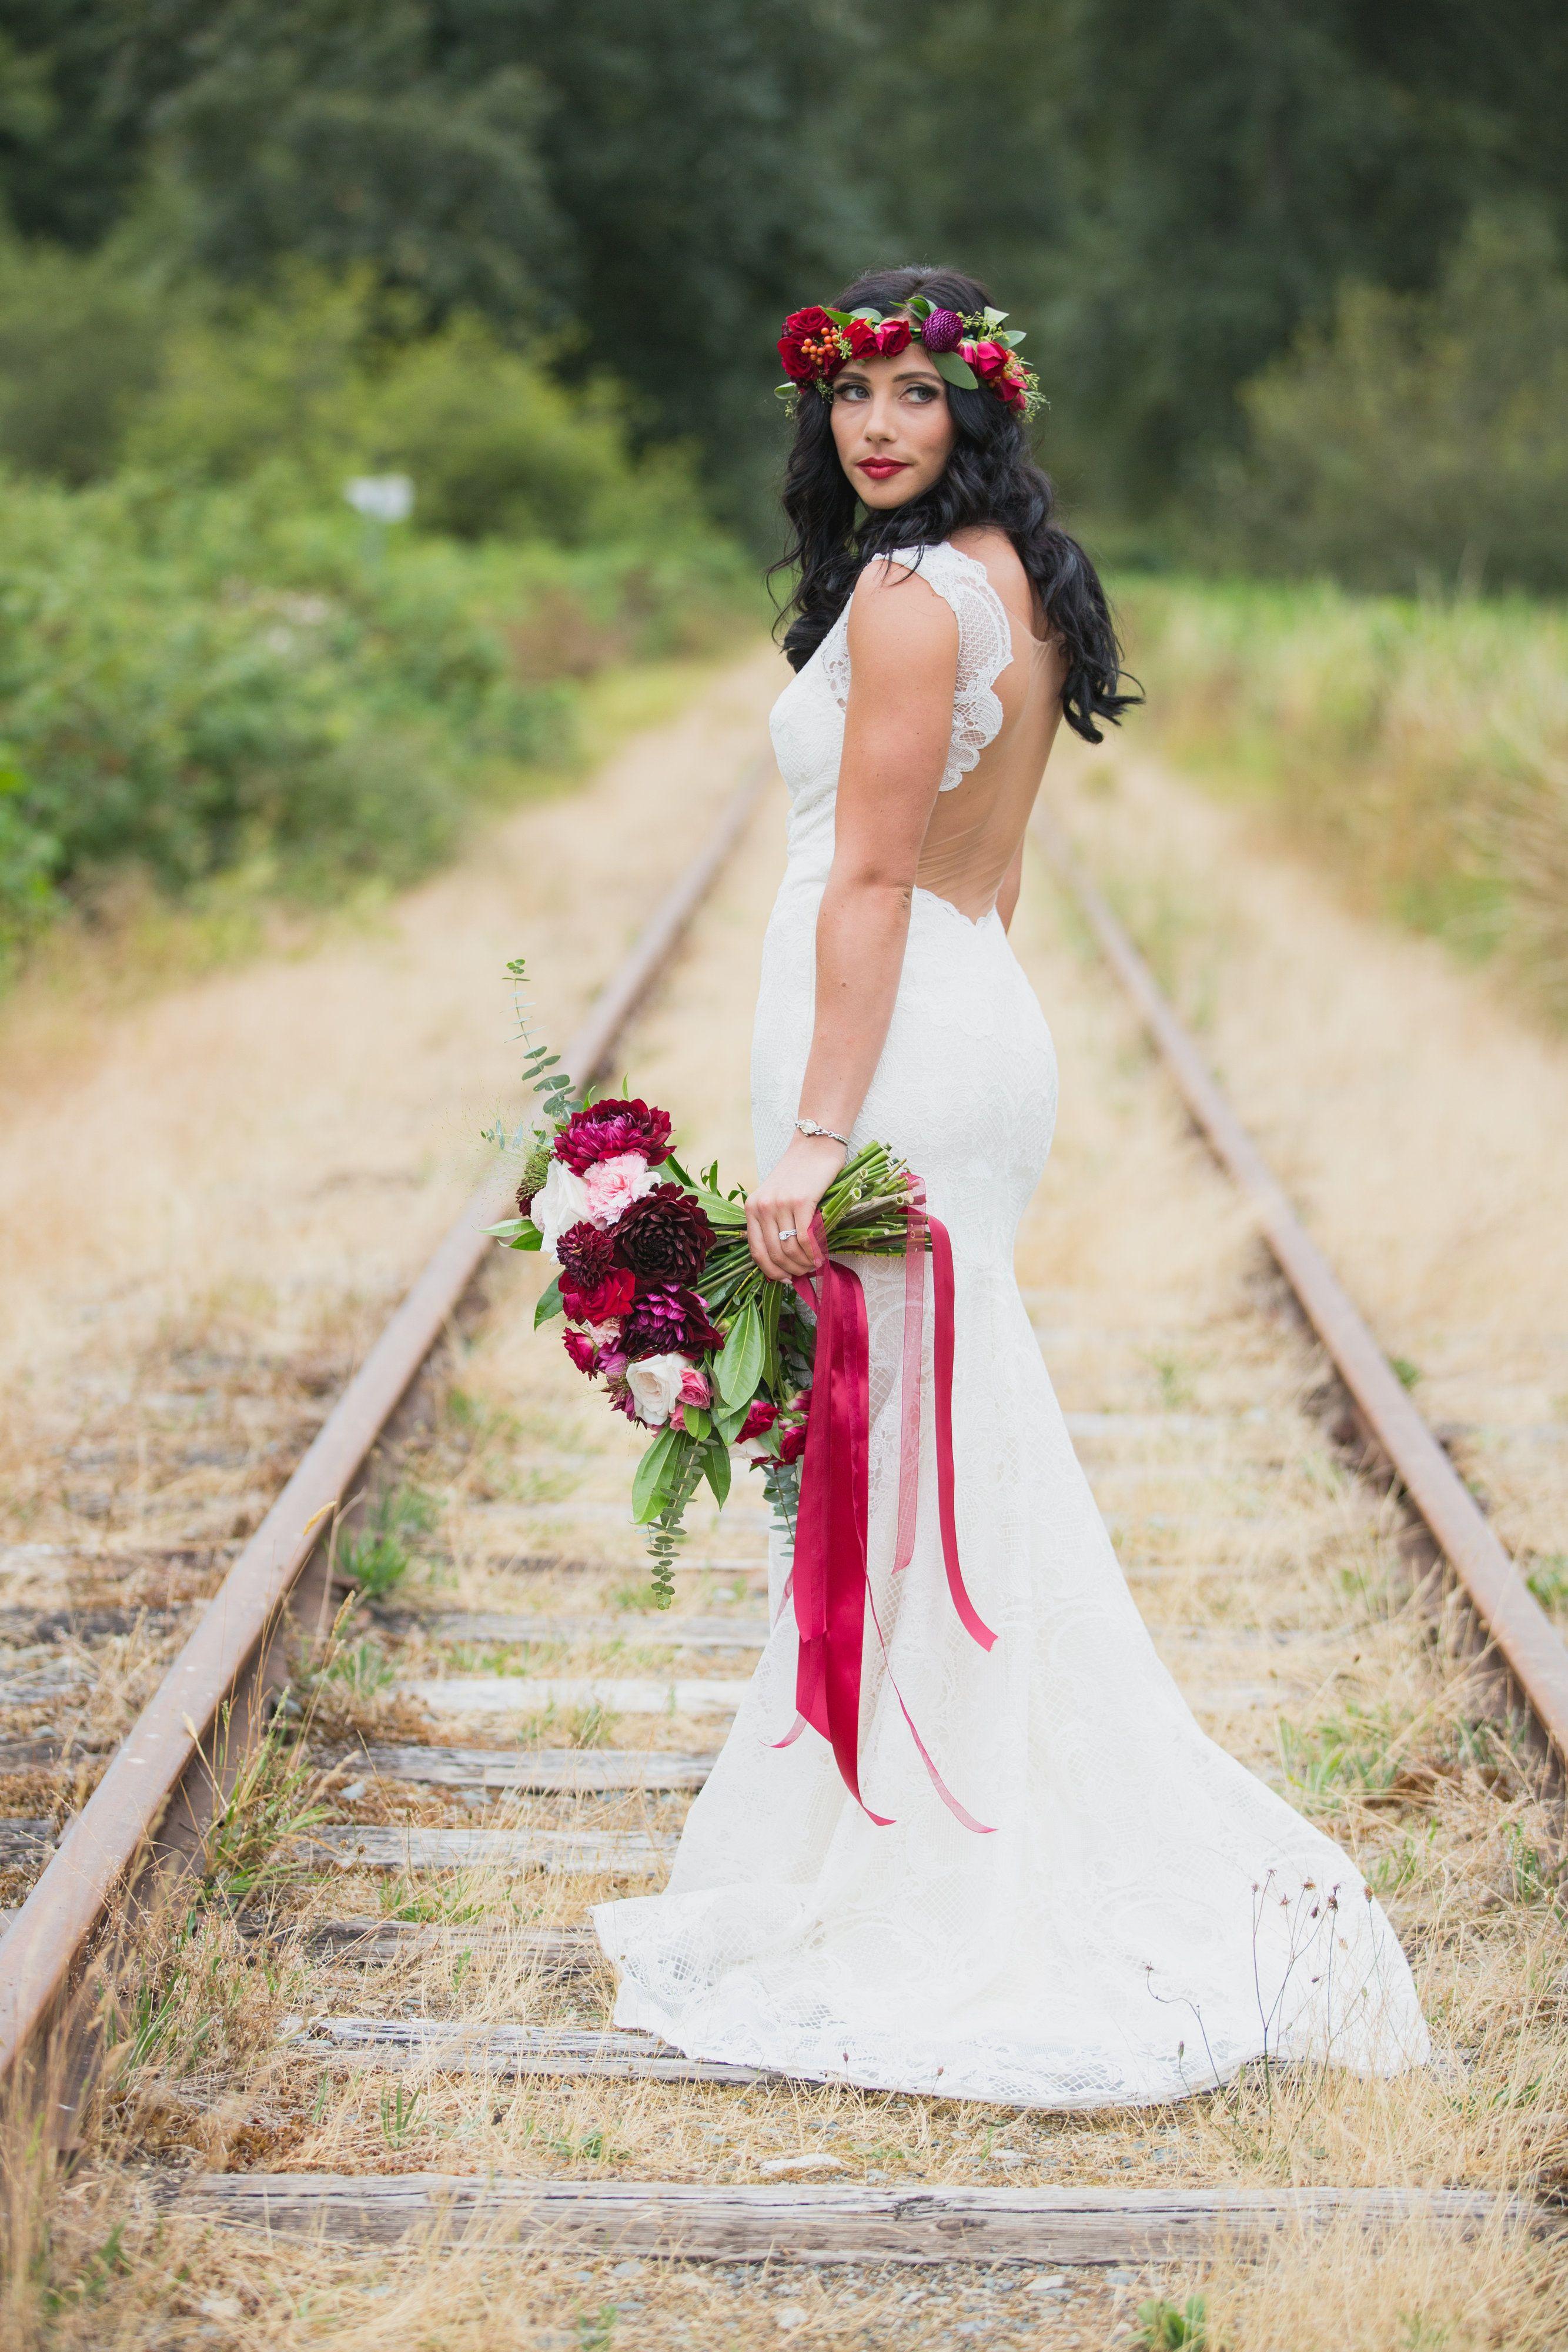 vsf feature wedding || steph & luke vancouver island, bc